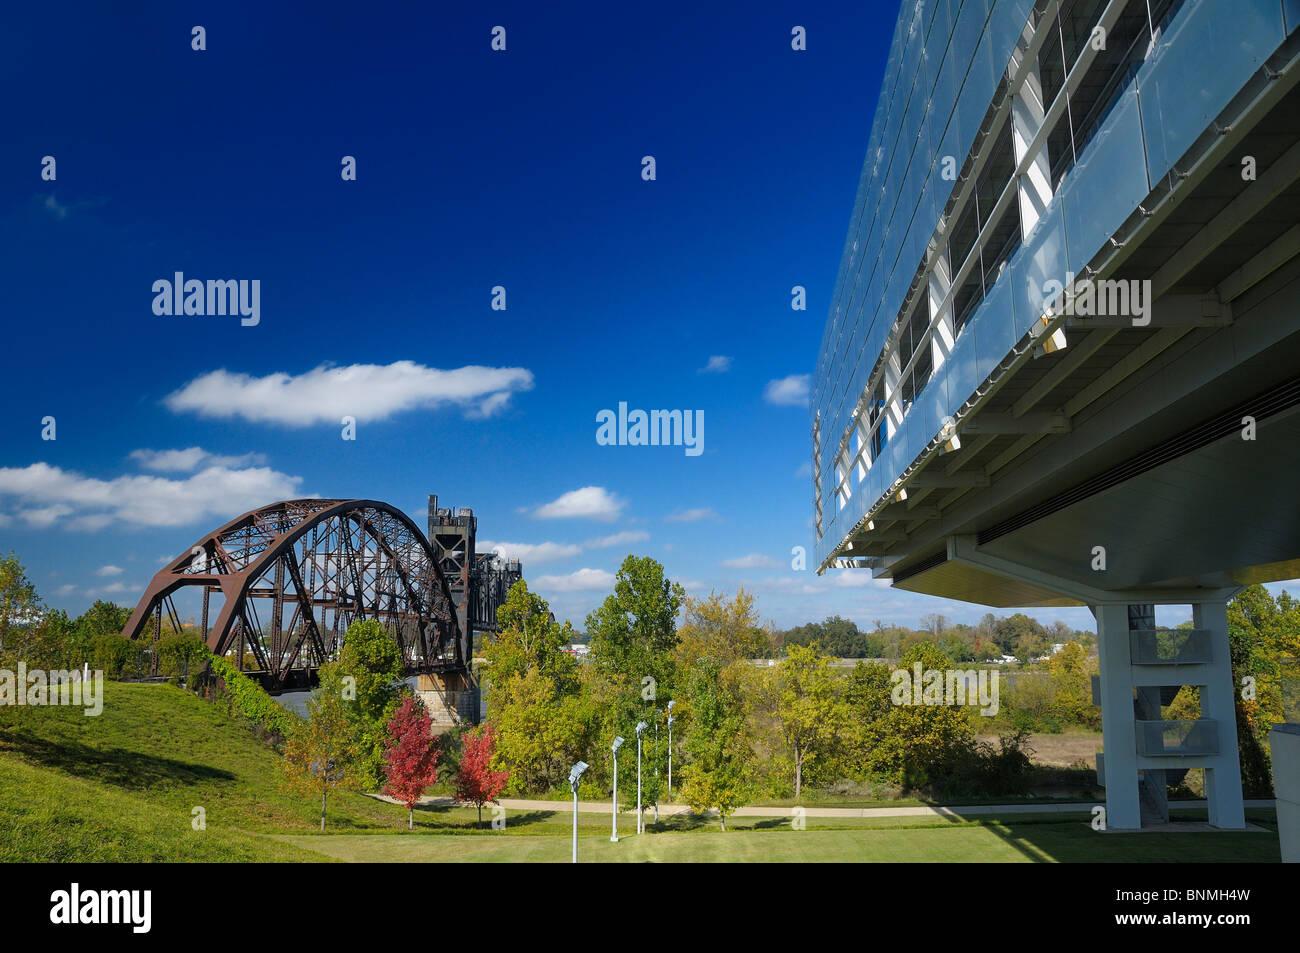 William J. Clinton Presidential Center & Park Bibliothek außen Little Rock Arkansas USA Park Bridge Architektur Stockbild